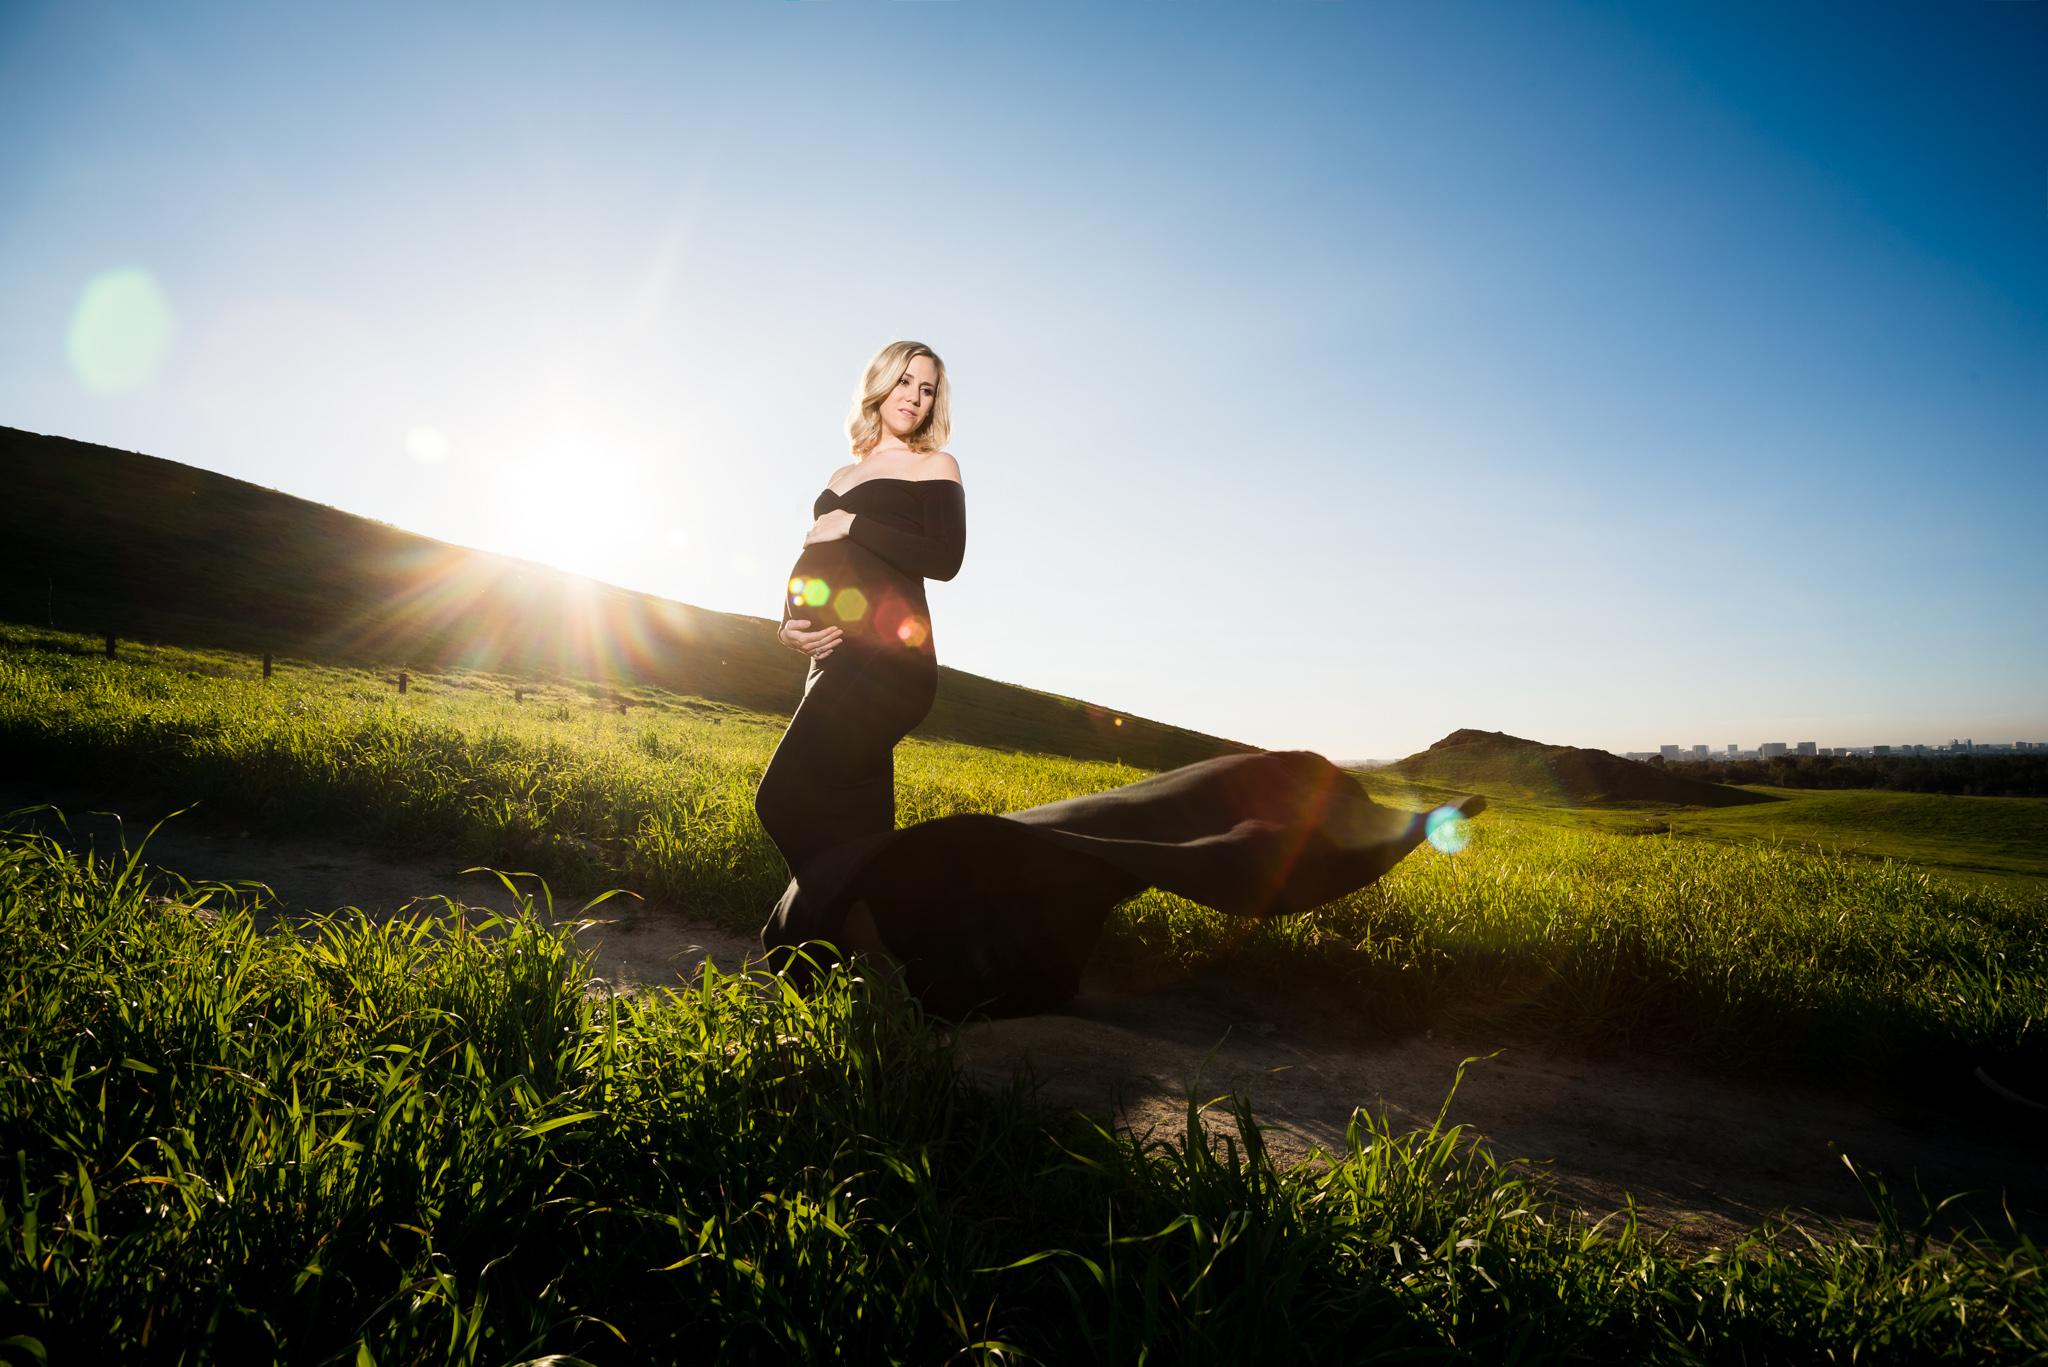 0020-Delana-Kopper-Quail-Hill-Irvine-Maternity-Photography